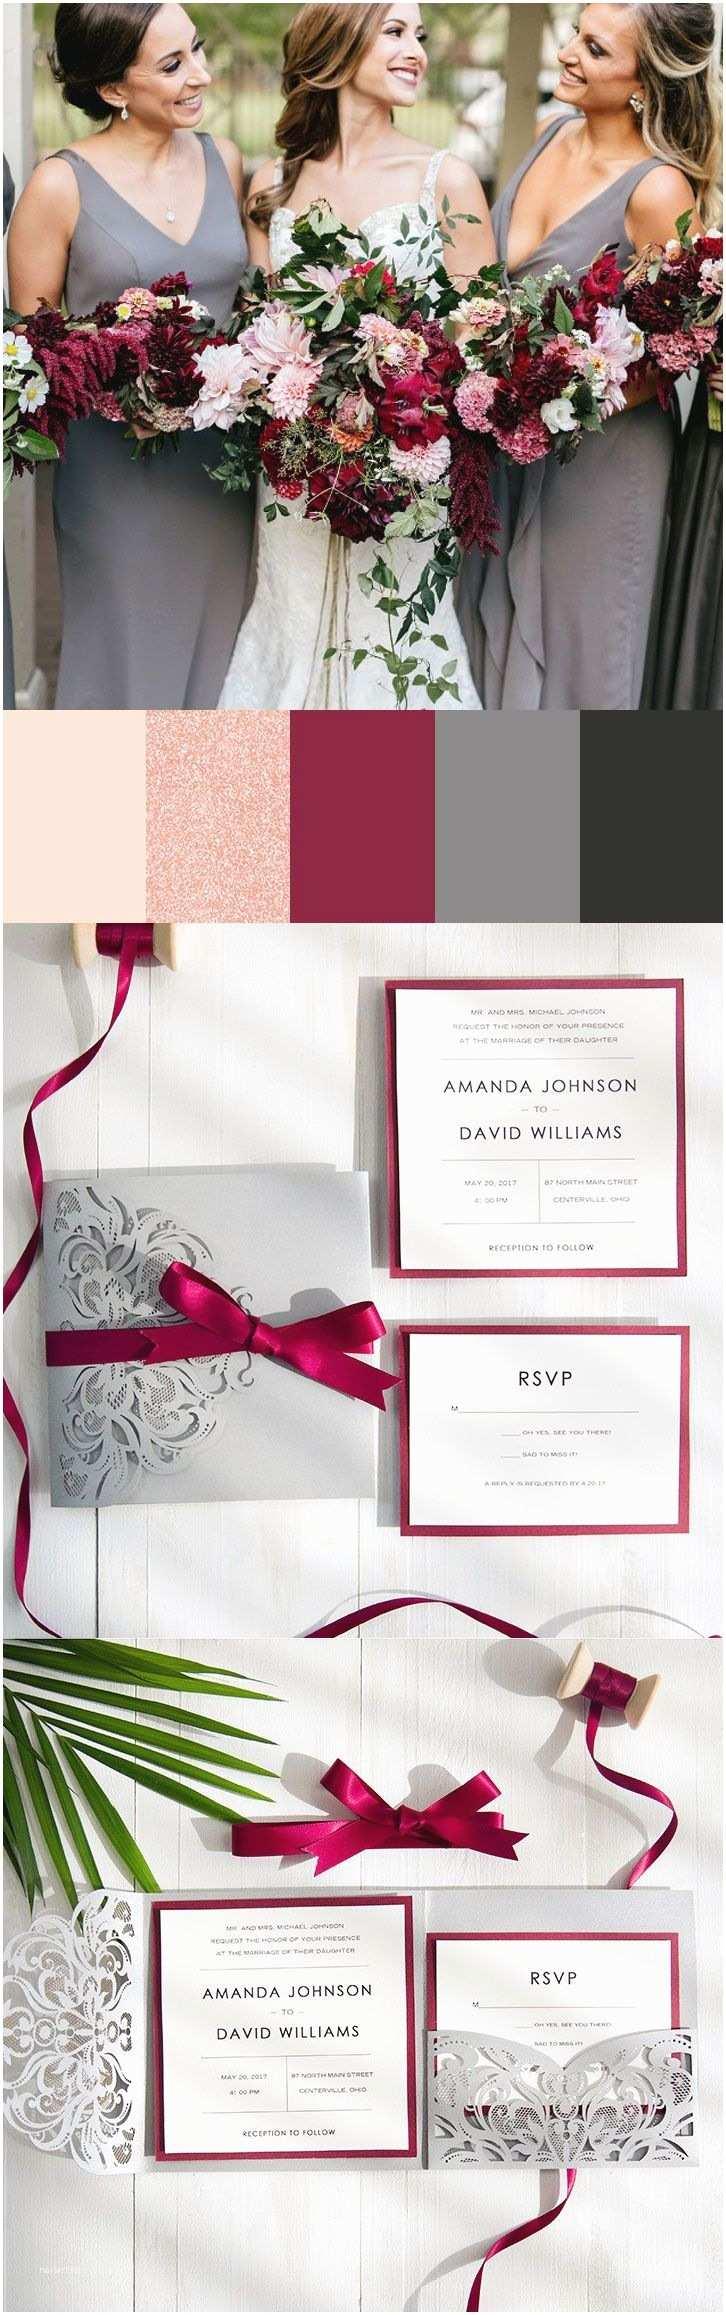 Burgundy and Grey Wedding Invitations Best 25 Burgundy Bouquet Ideas On Pinterest